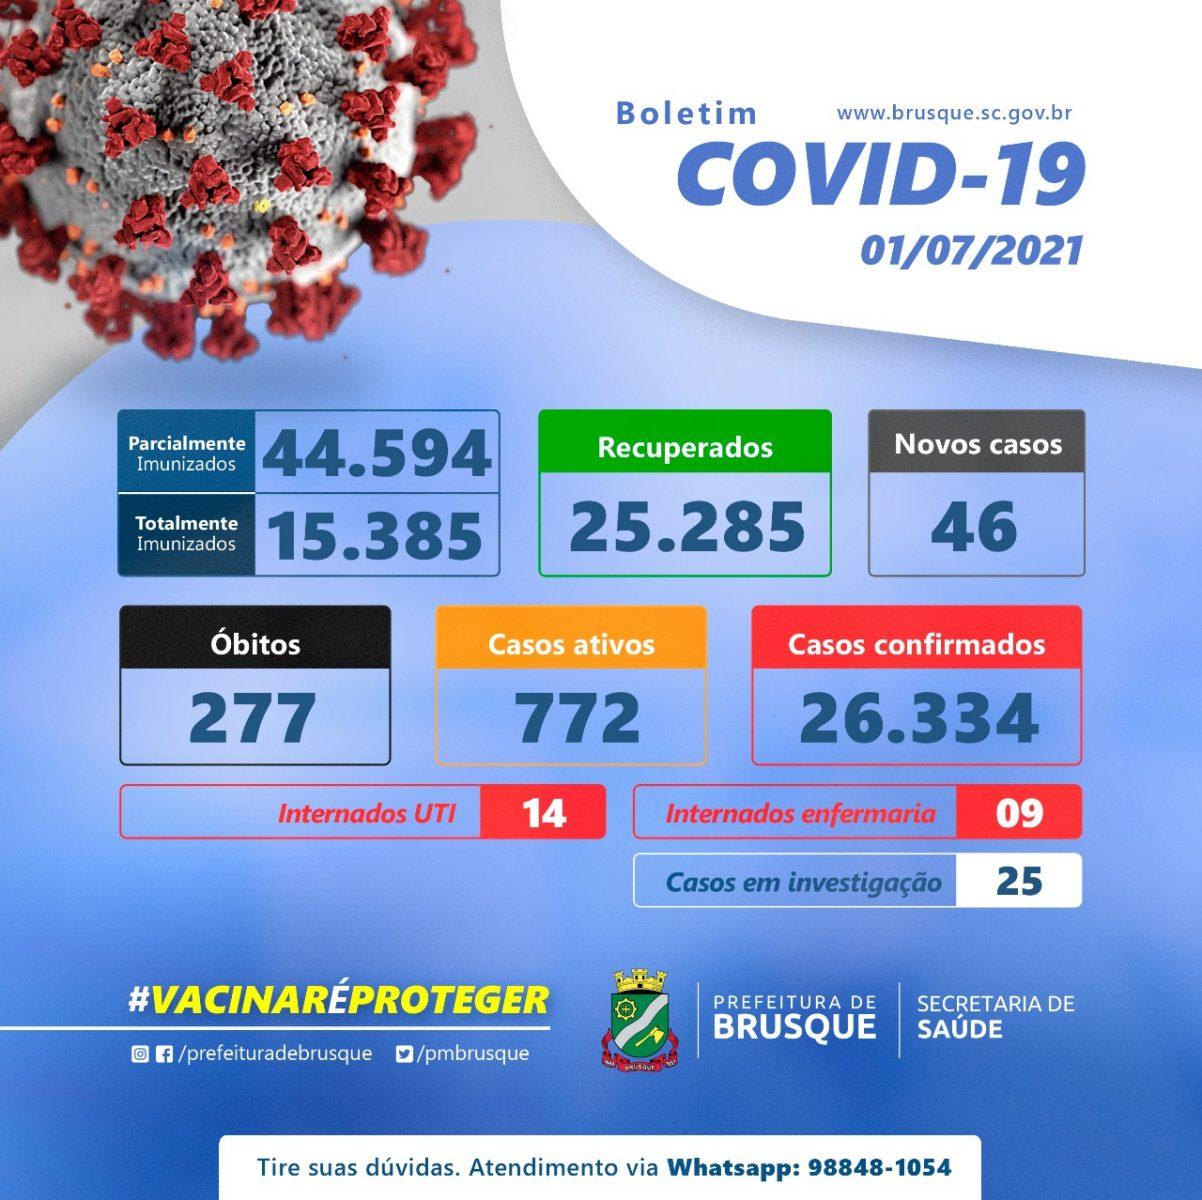 Covid-19: Confira o boletim epidemiológico desta quinta-feira (01)